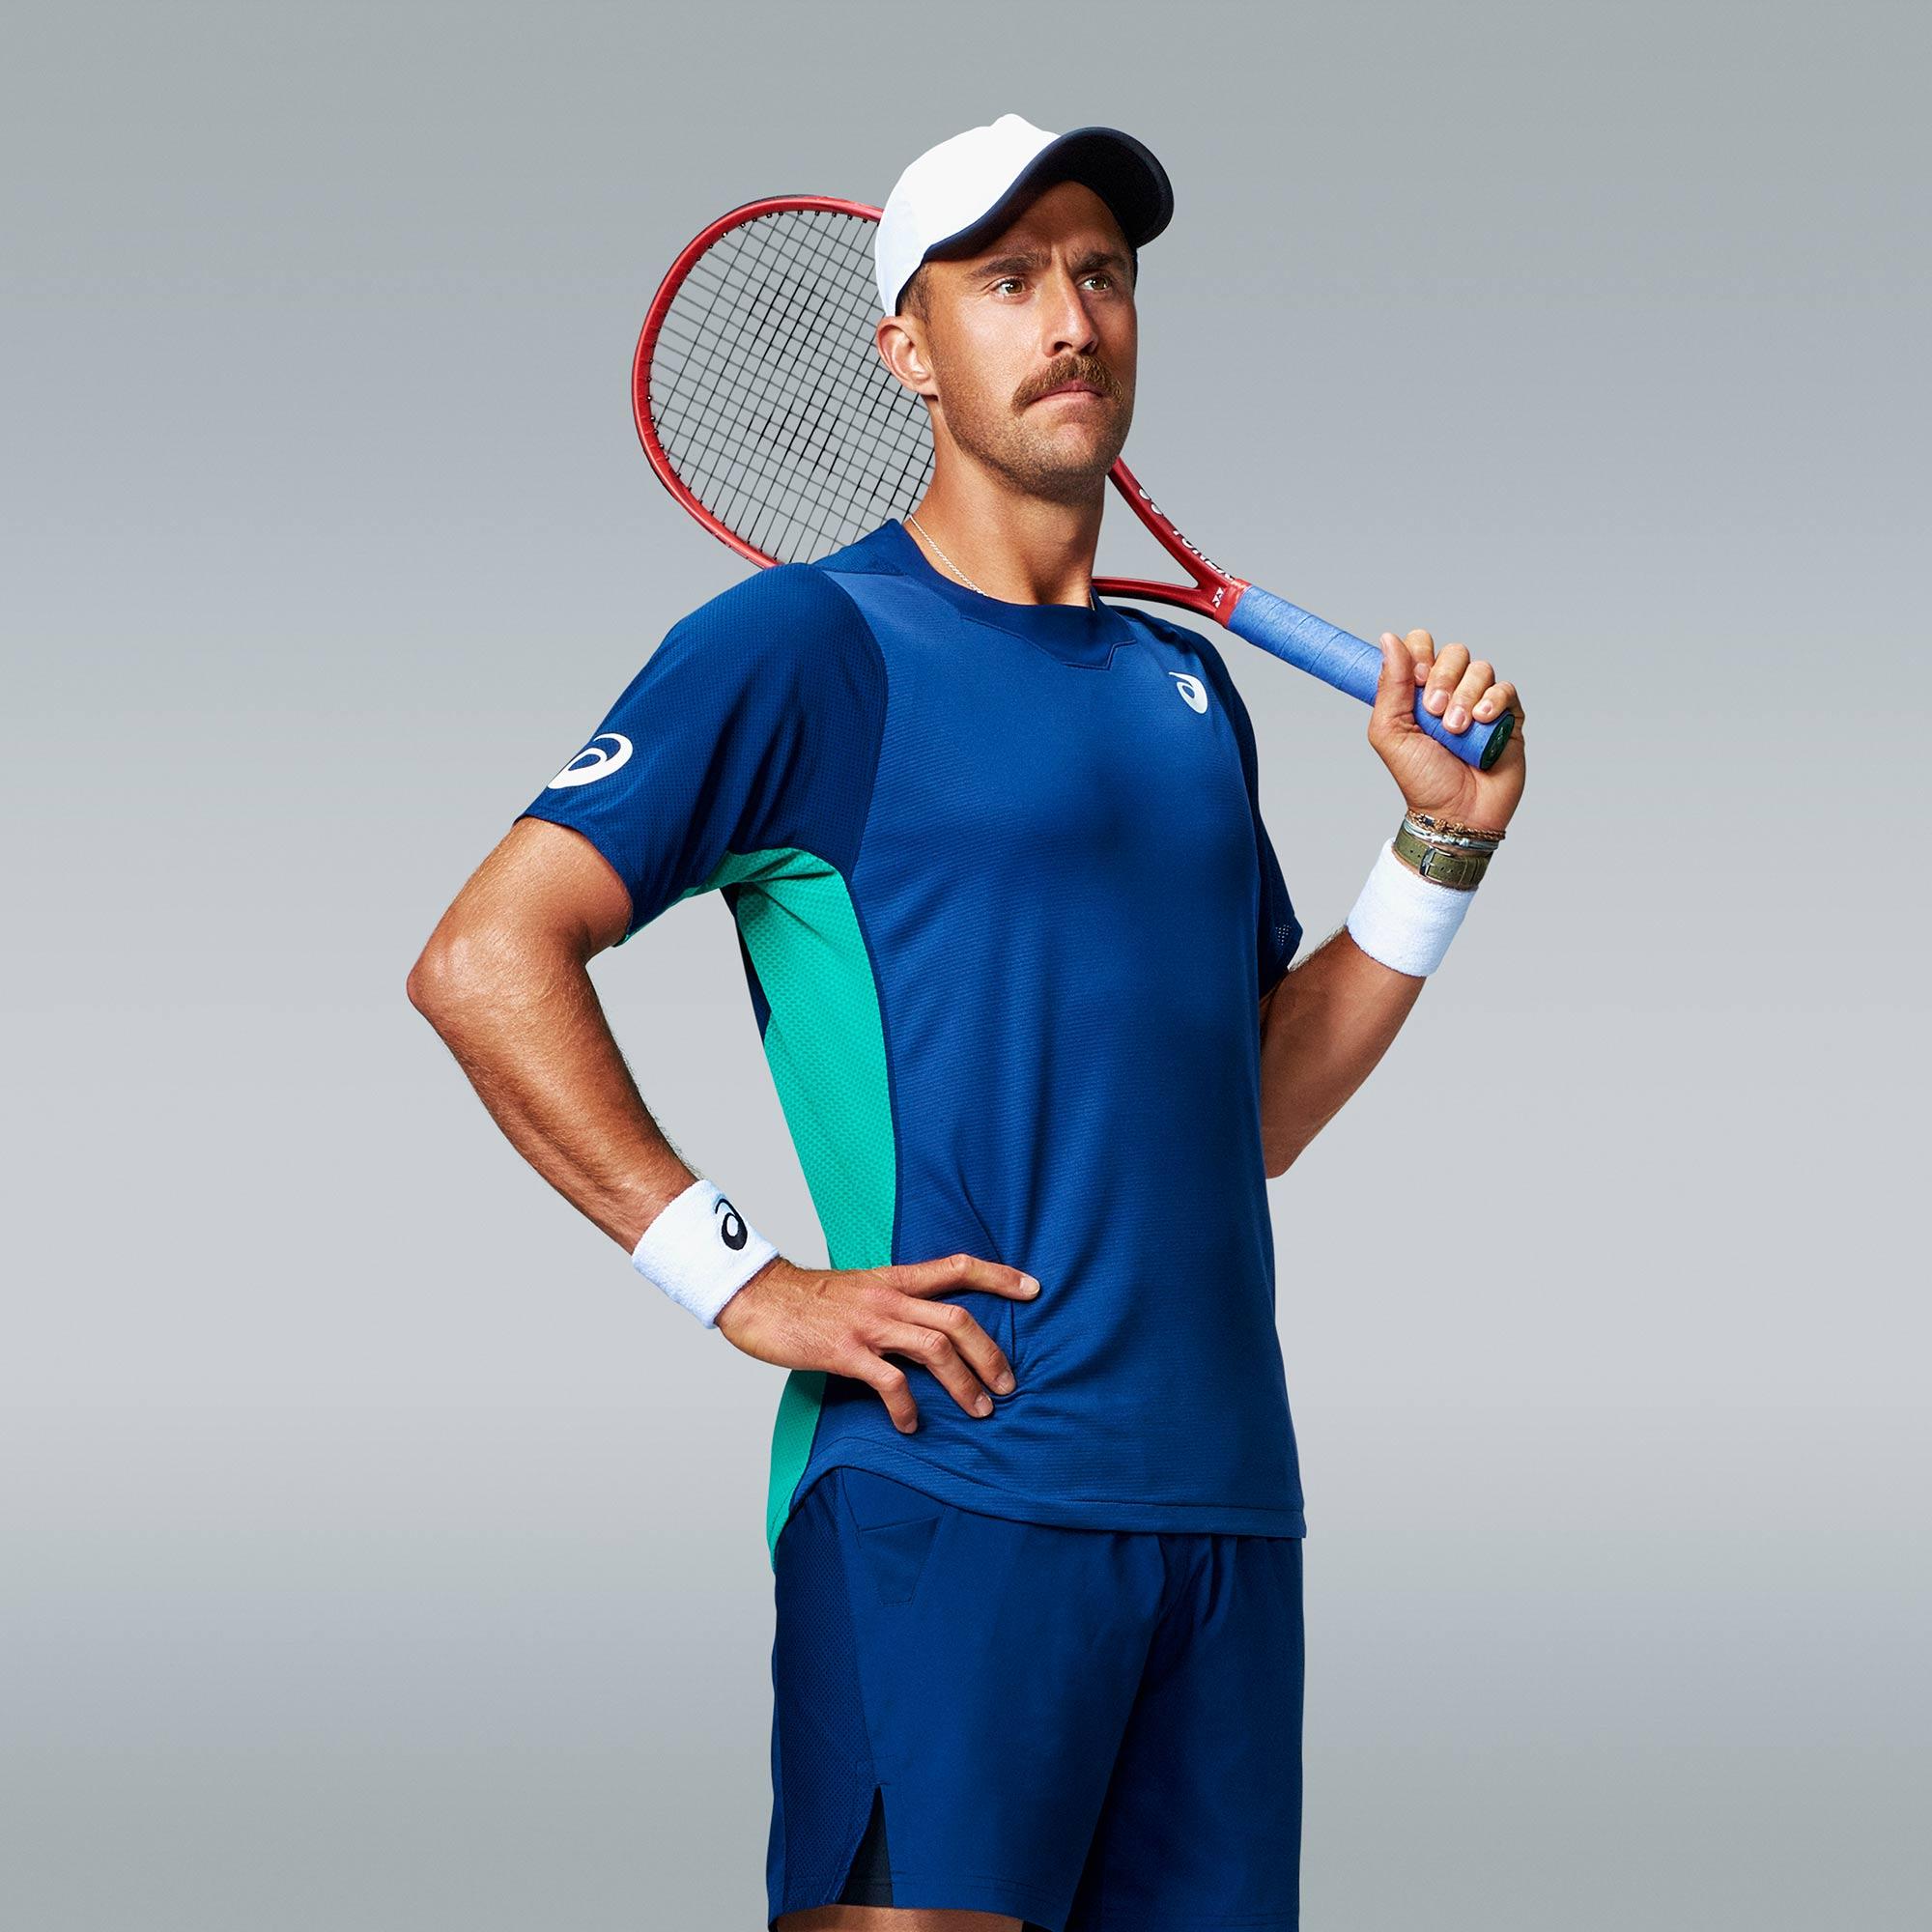 tennis player steve johnson possess for a portrait in studio using profoto flash photography